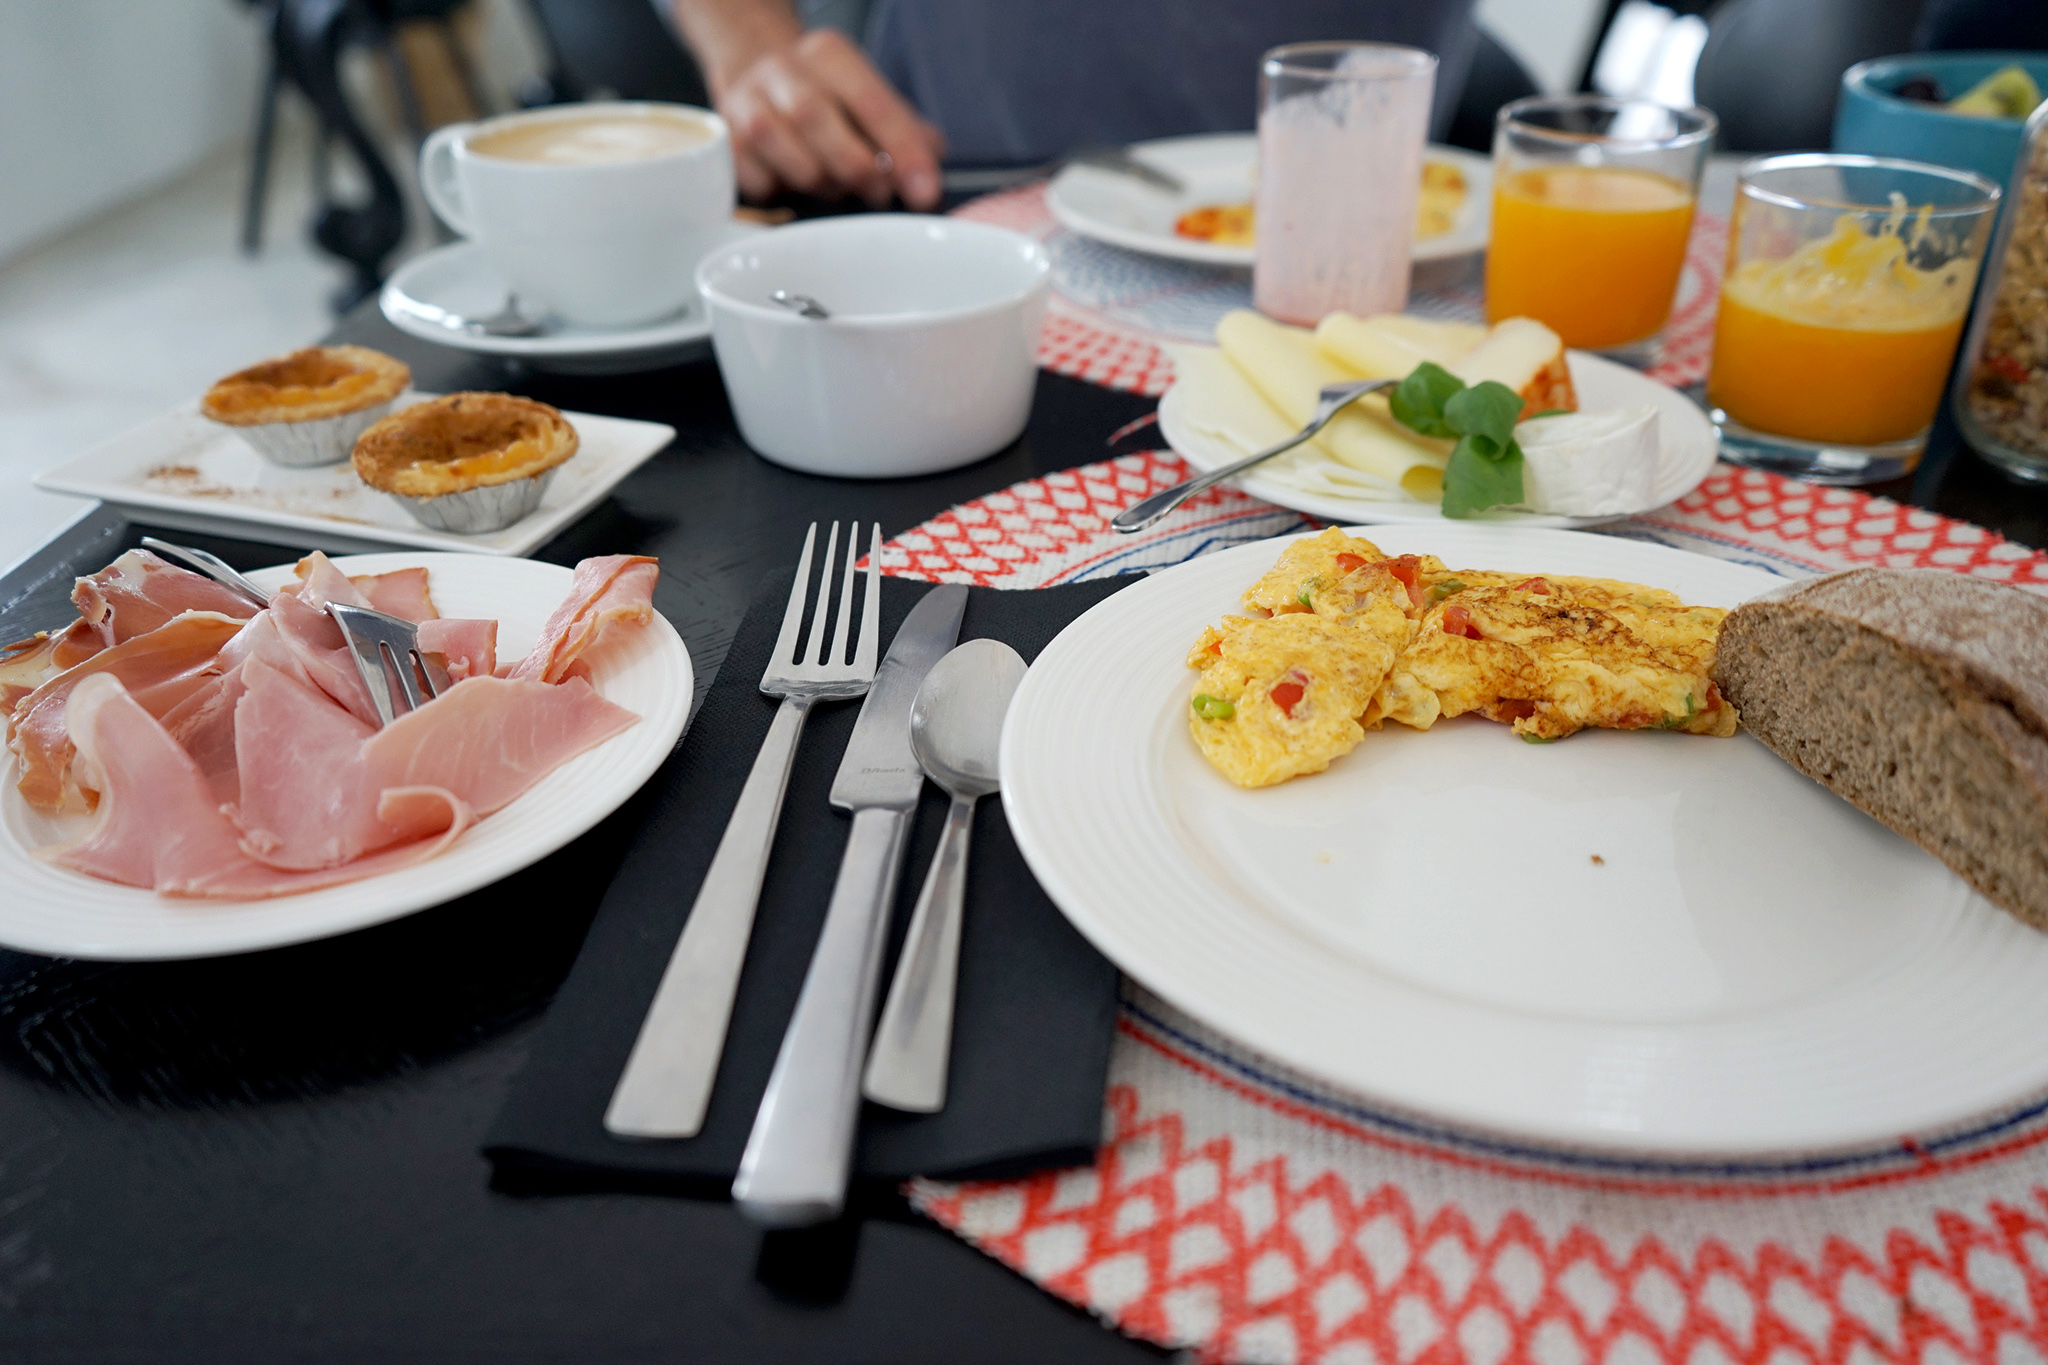 2017-04-Casa-Arte-Bad-Gastein - casa-arte-algarve-nectarandpulse-breakfast-11.jpg